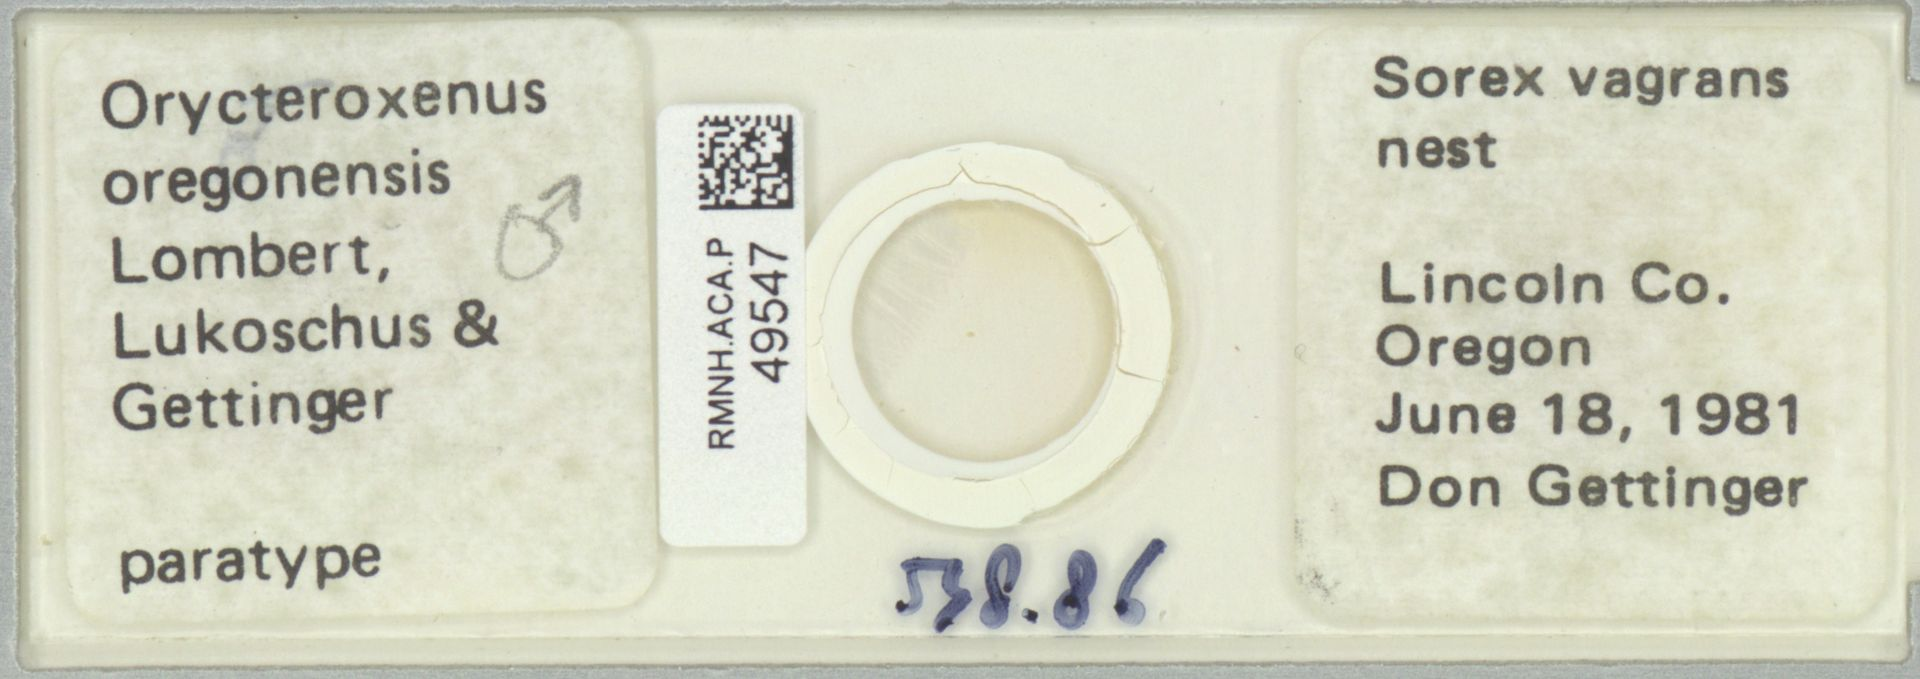 RMNH.ACA.P.49547 | Orycteroxenus oregonensis Lombert, Lukoschus & Gettinger